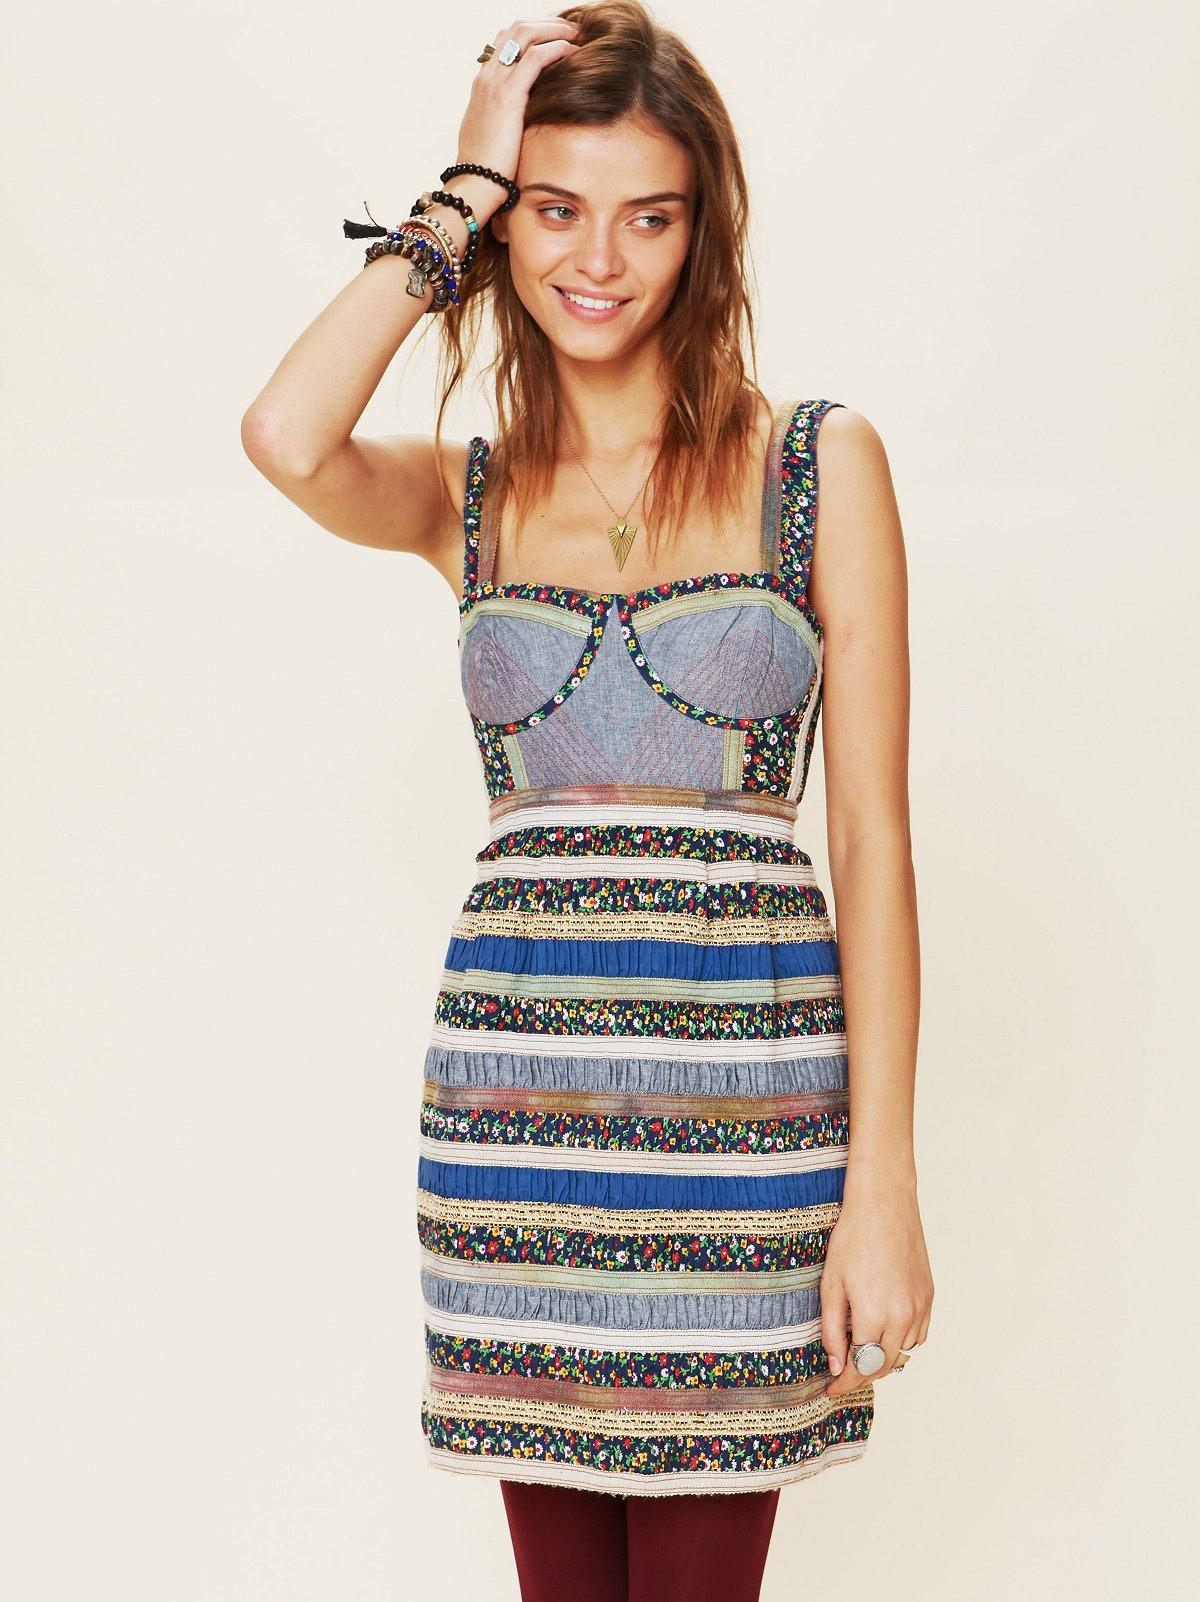 FP New Romantics Ol' Oprey Smocked Dress